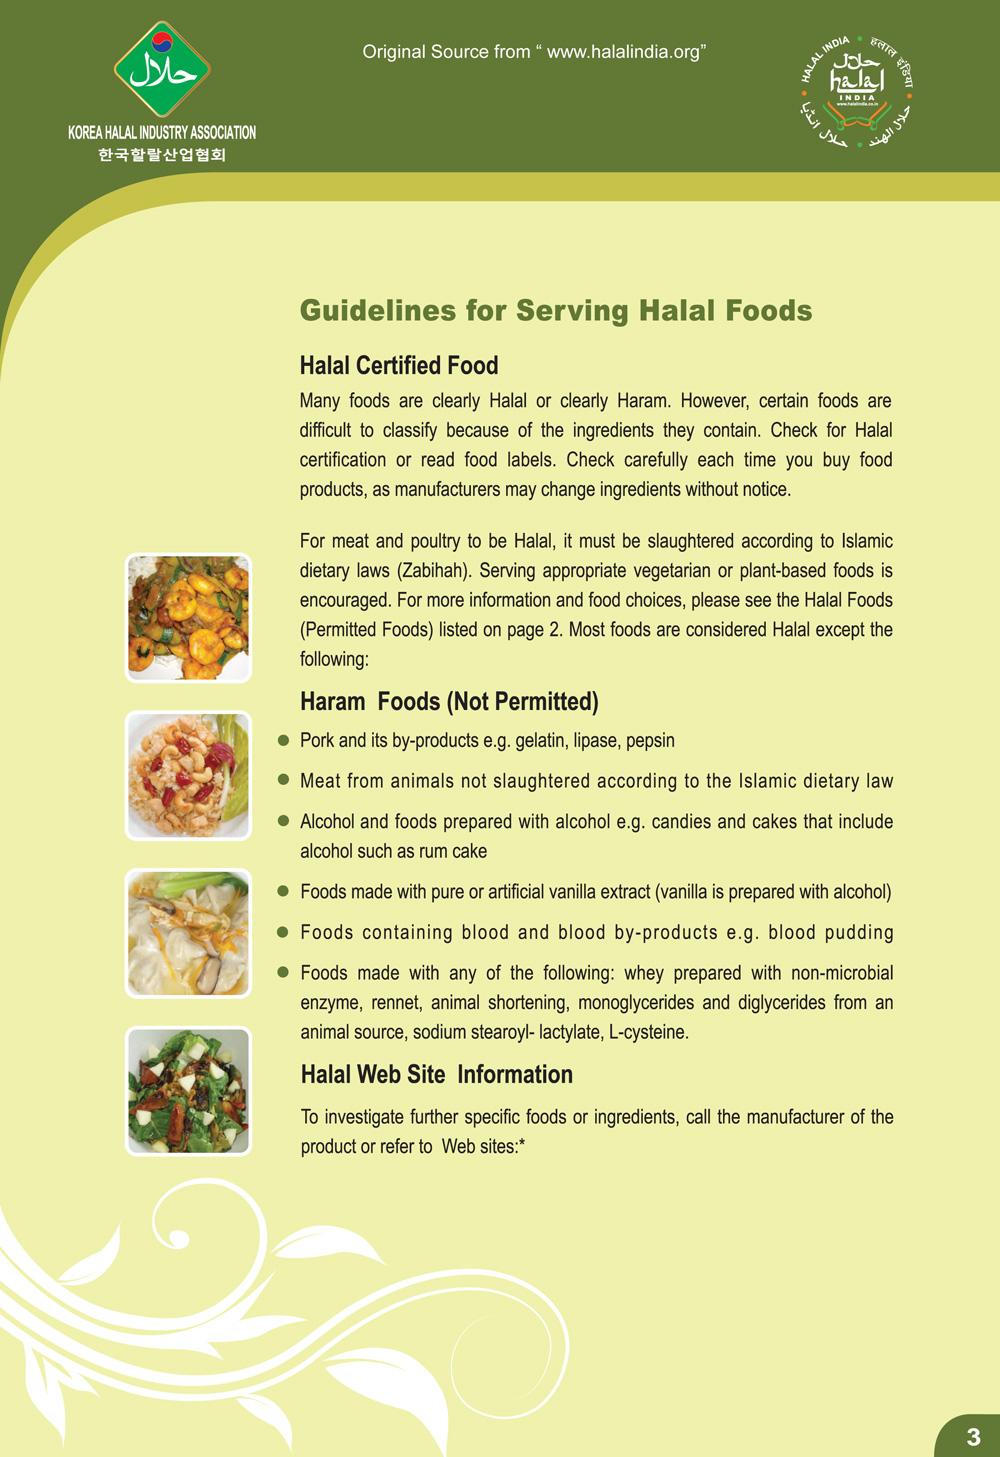 halal-food-guide-3